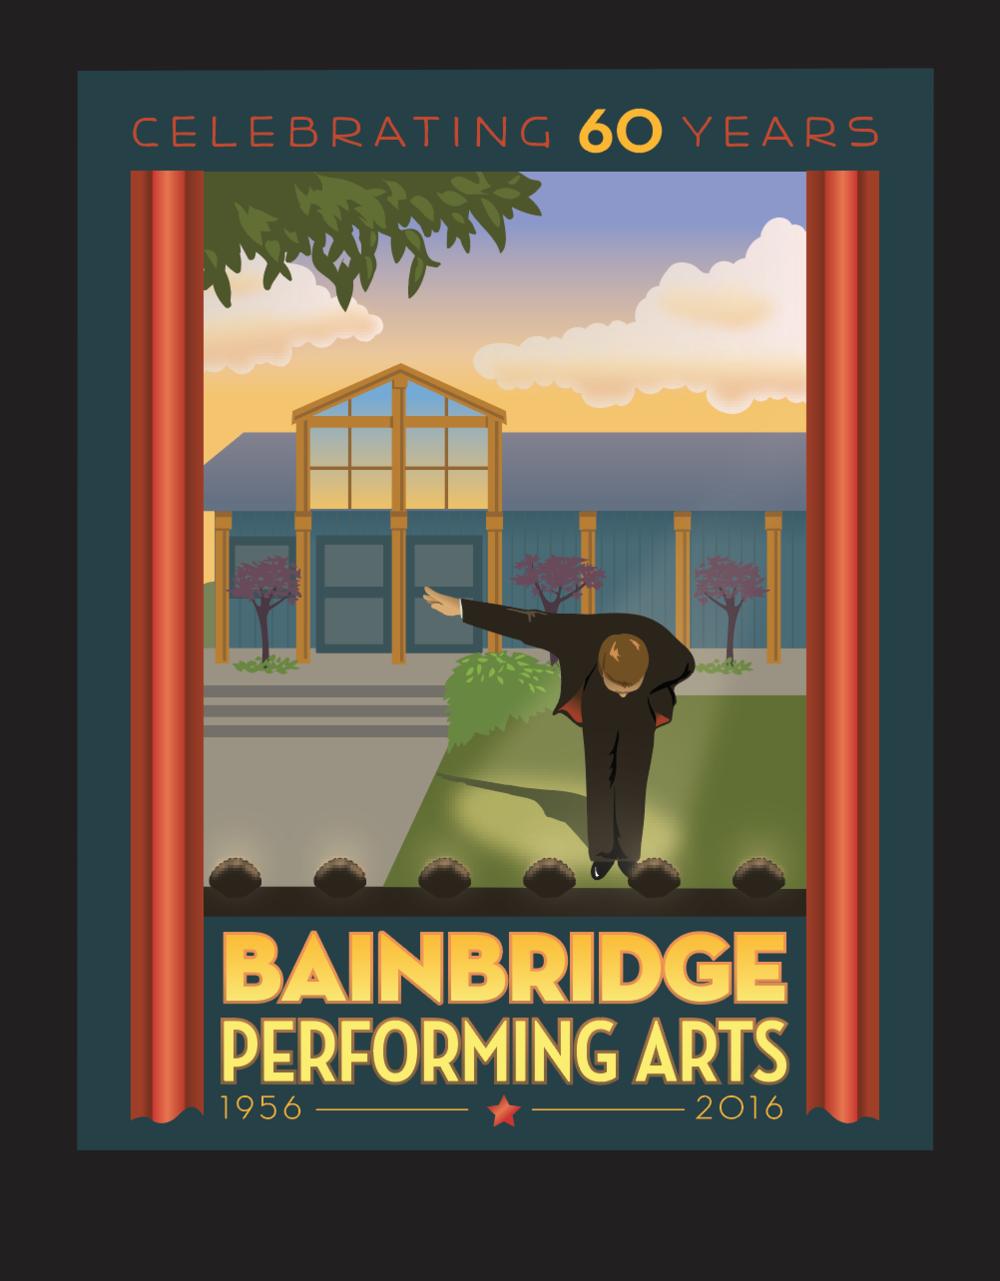 Bainbridge Performing Arts Takes a Bow